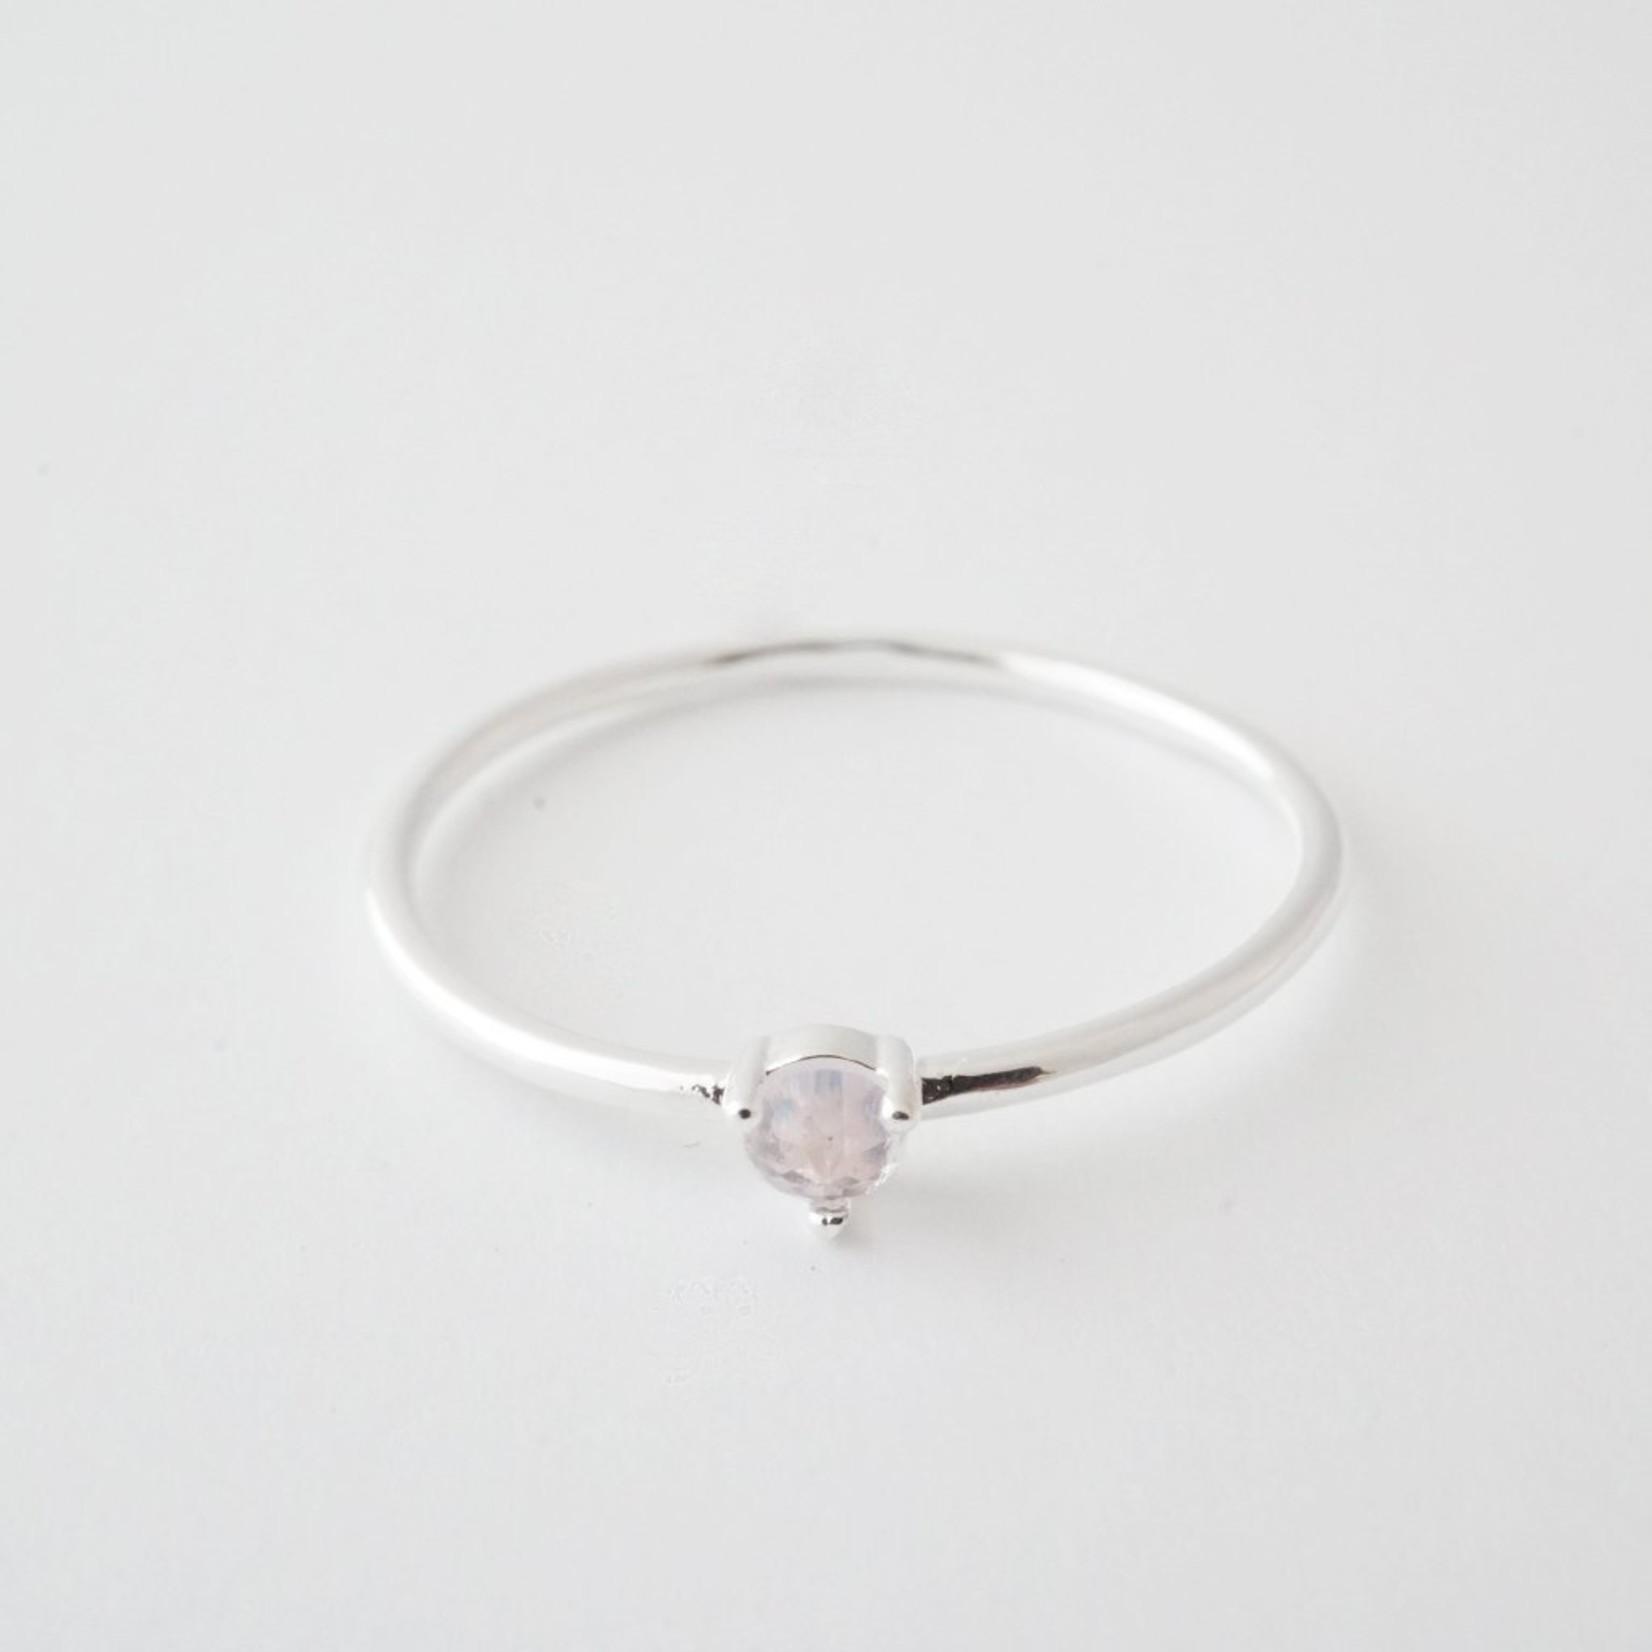 Honeycat Jewelry Honeycat Point Solitaire Ring ROSE QUARTZ